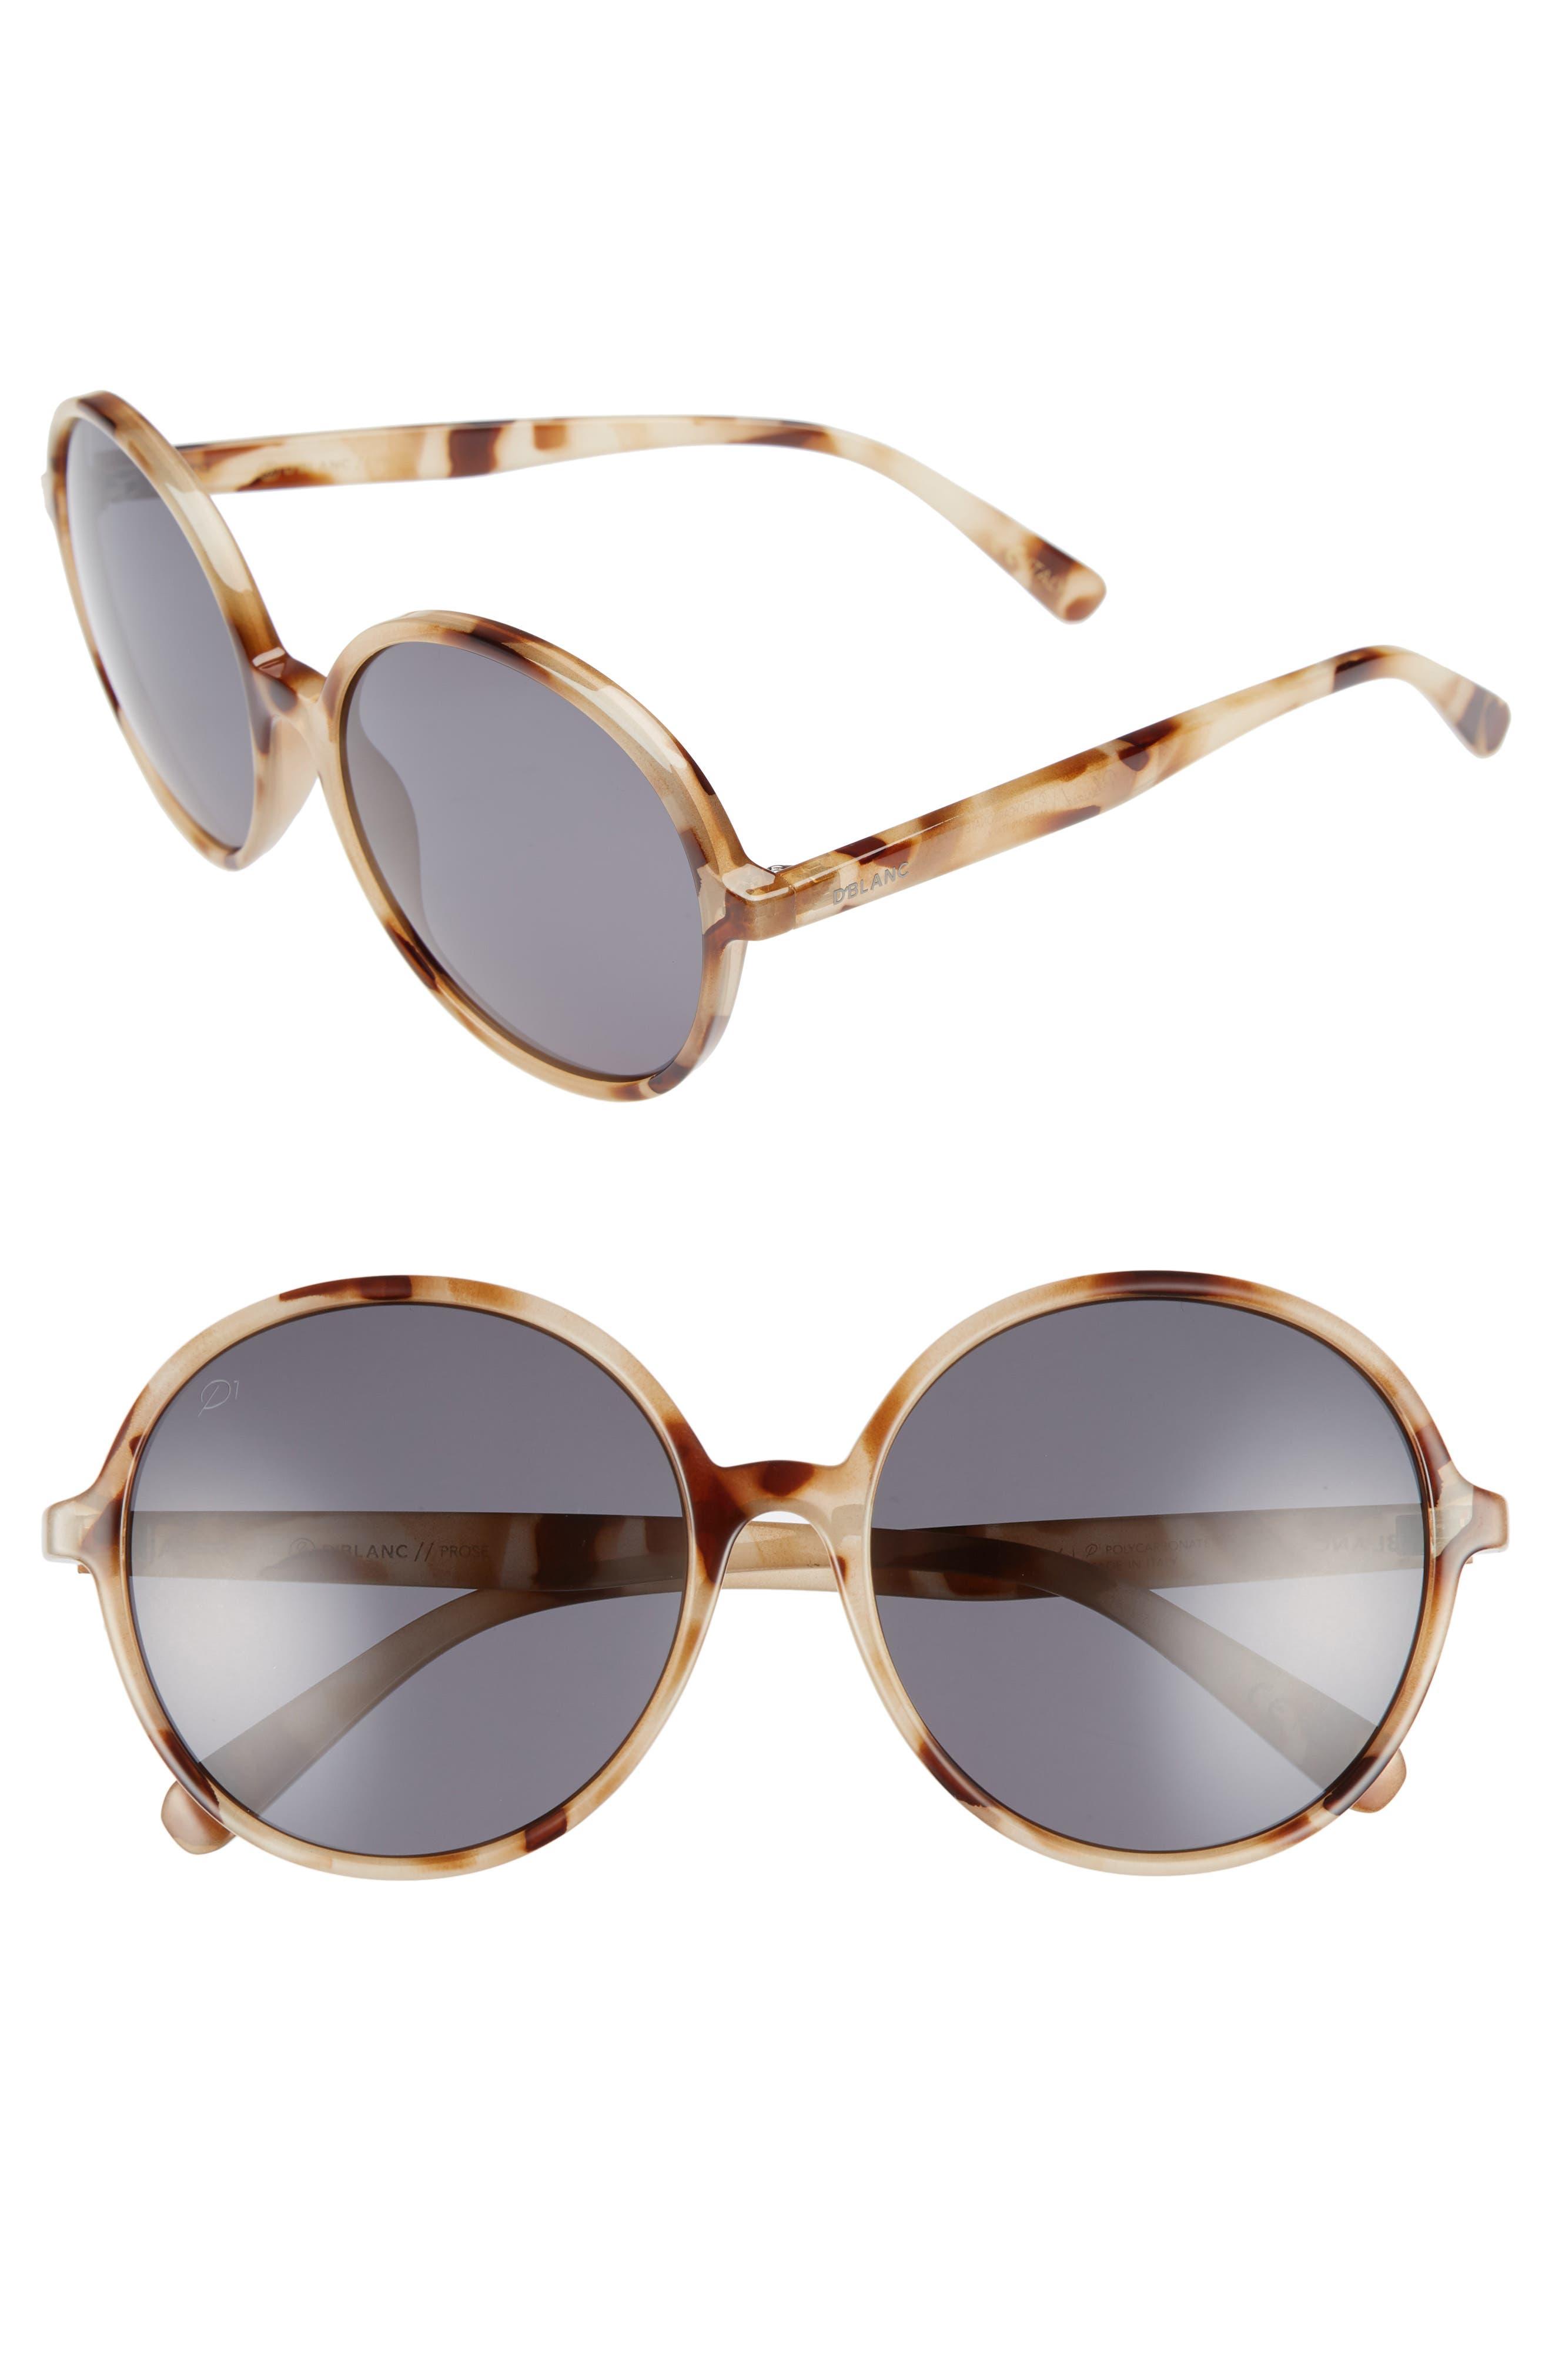 D'BLANC Prose 59mm Round Sunglasses,                         Main,                         color, SNOW LEOPARD/ GREY POLAR